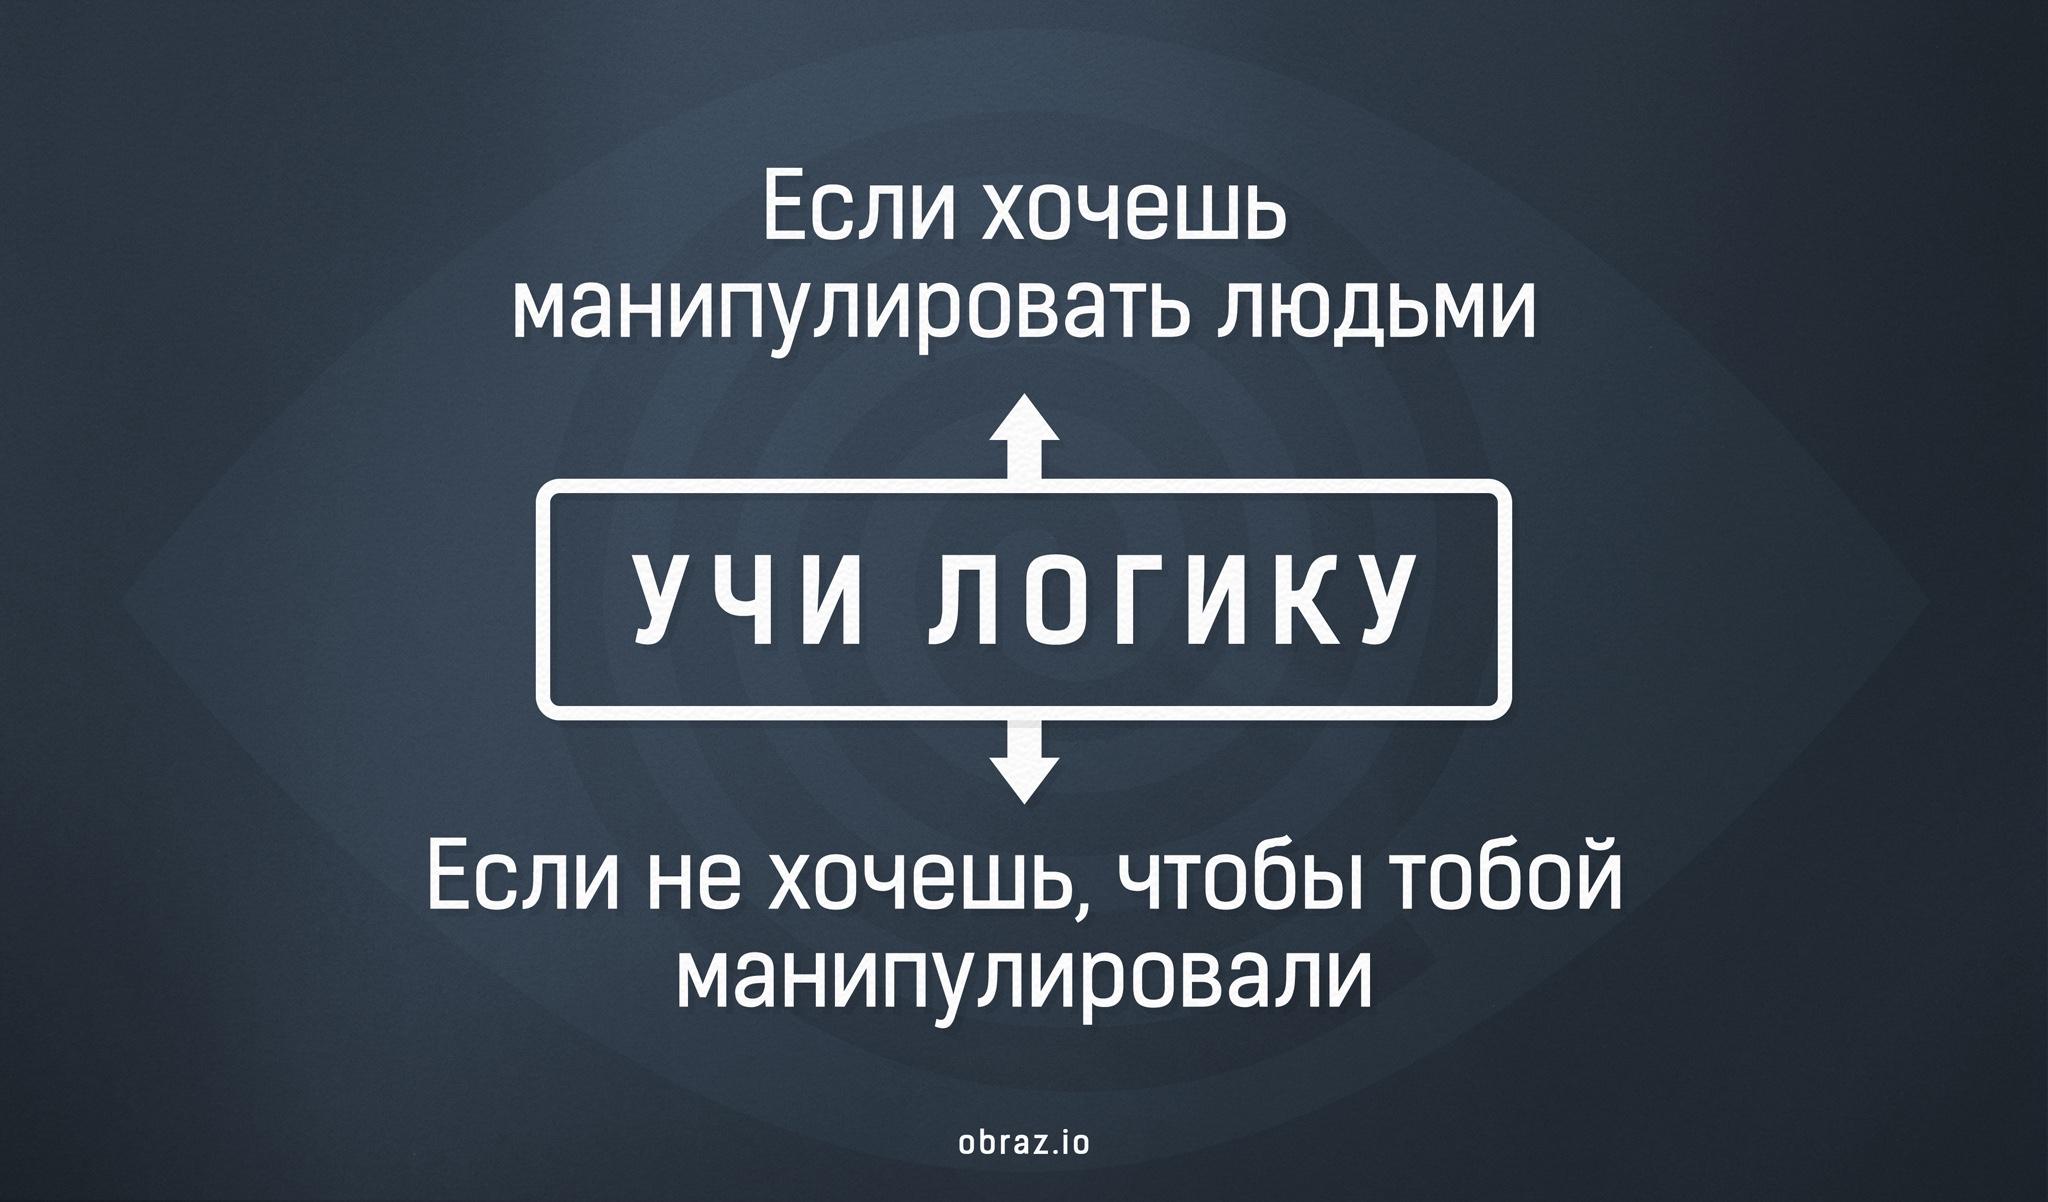 Email:learningkurakov@gmail com3292 1jl9kh0.zj4nc7syvi